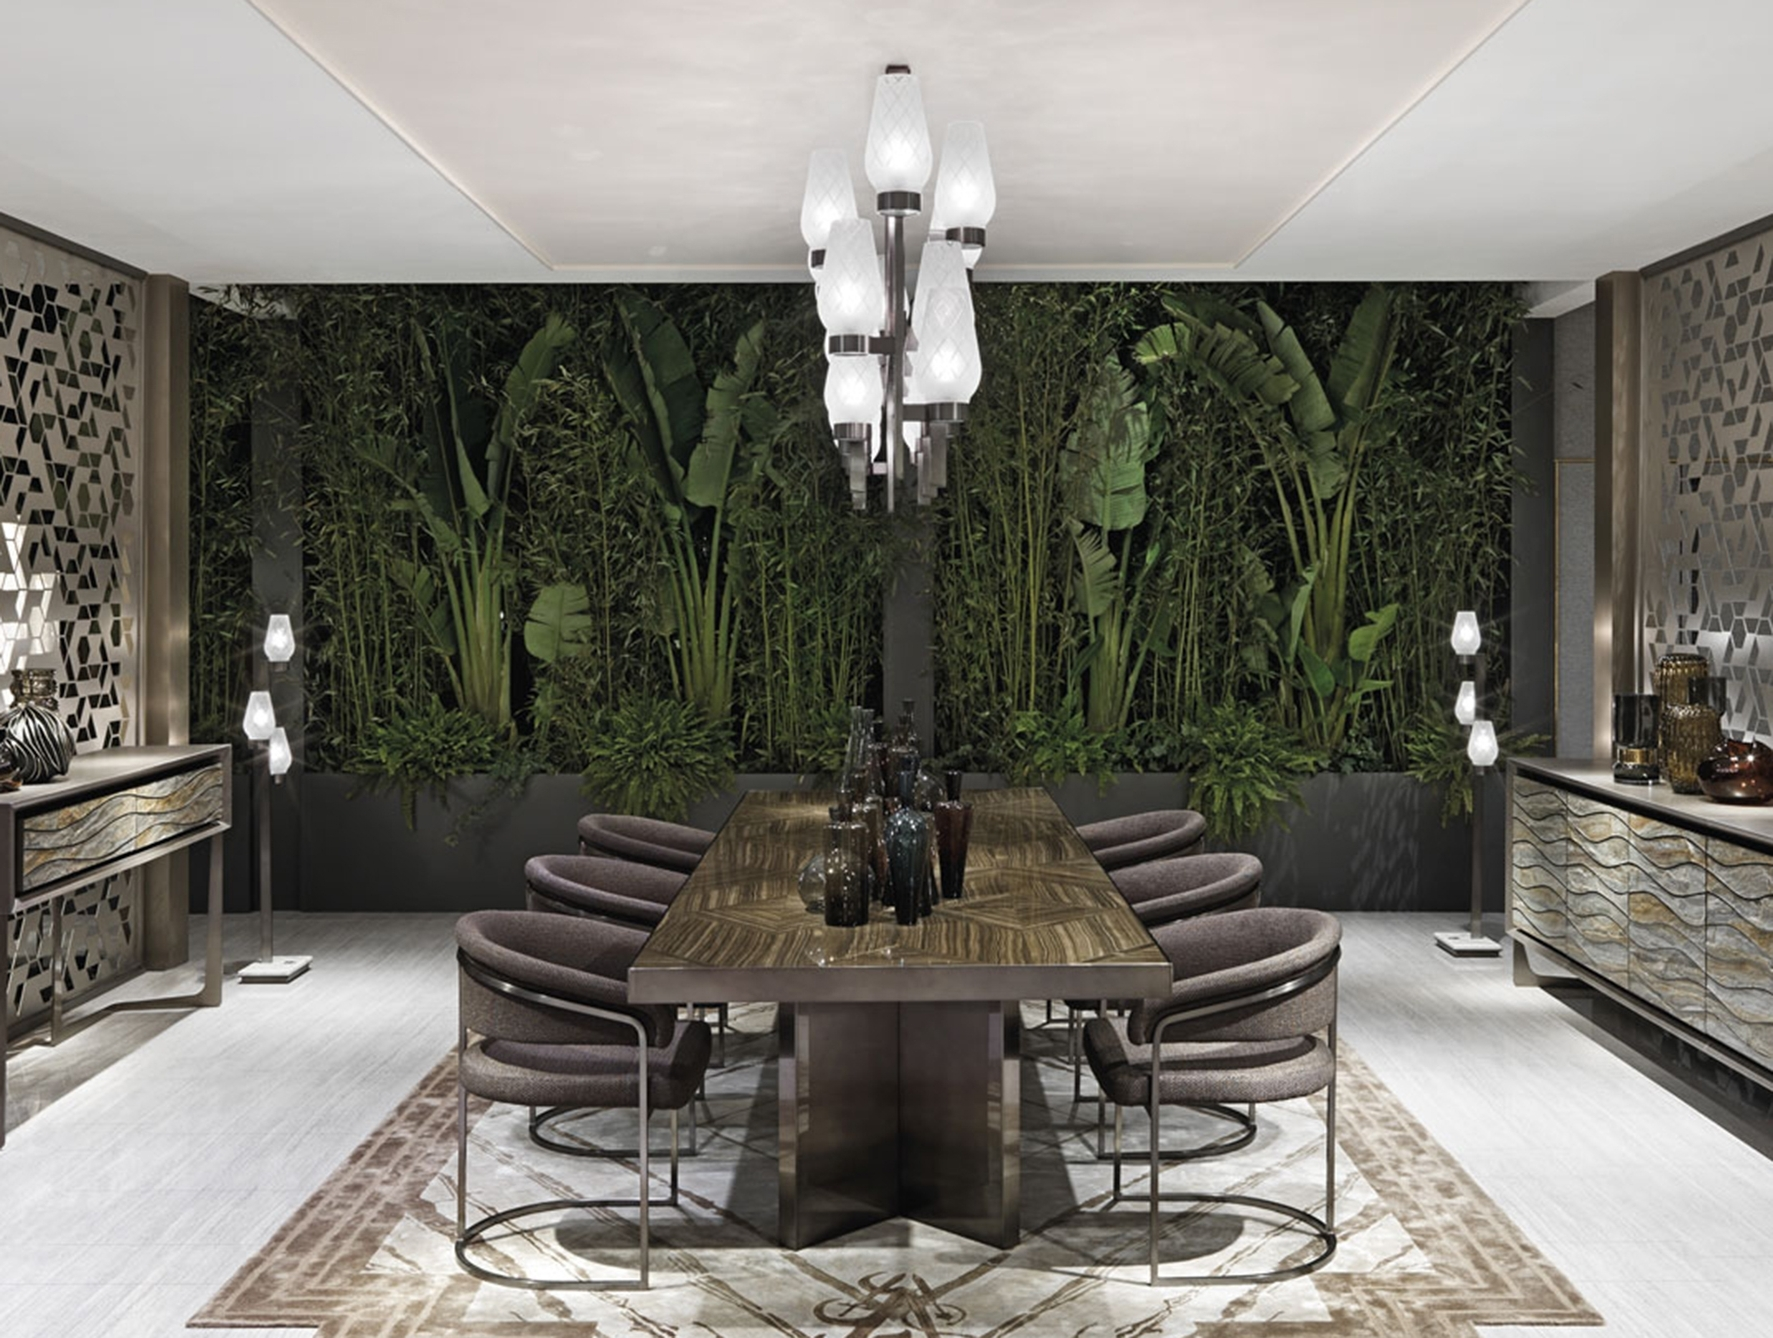 Favorite Designer Italian Dining Tables & Luxury High End Dining Tables In Italian Dining Tables (View 7 of 25)